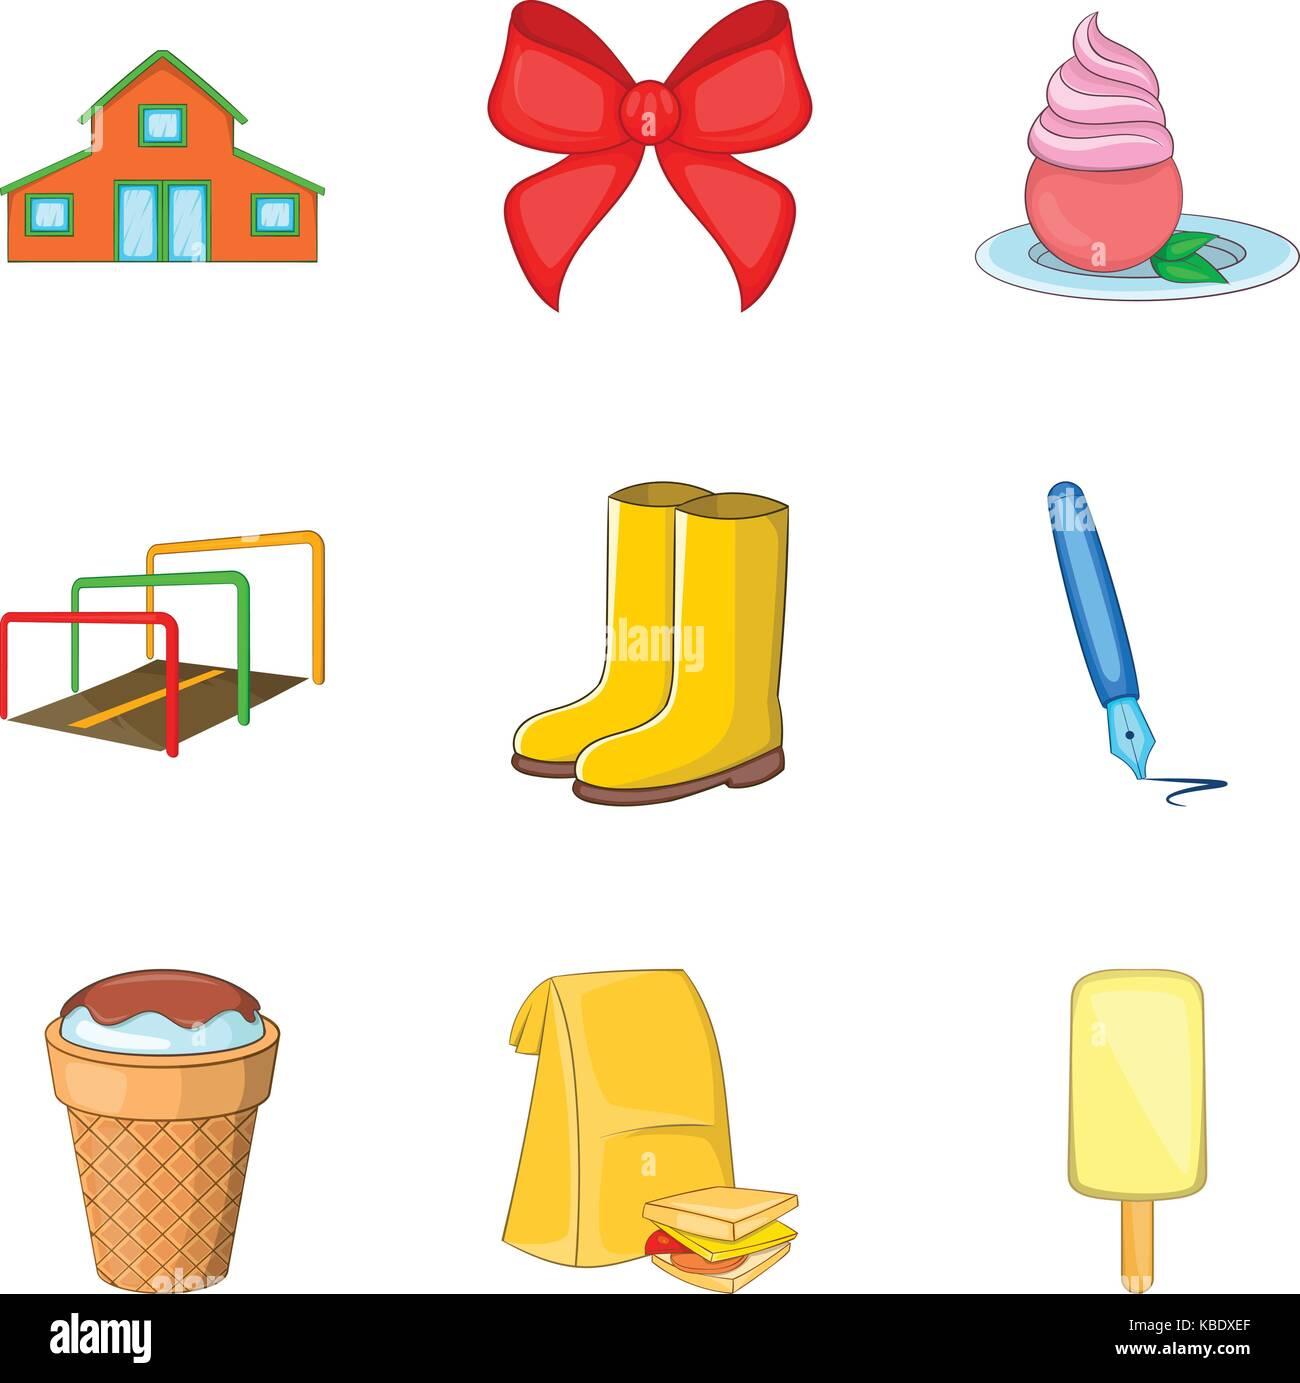 Grandchild icons set, cartoon style - Stock Image